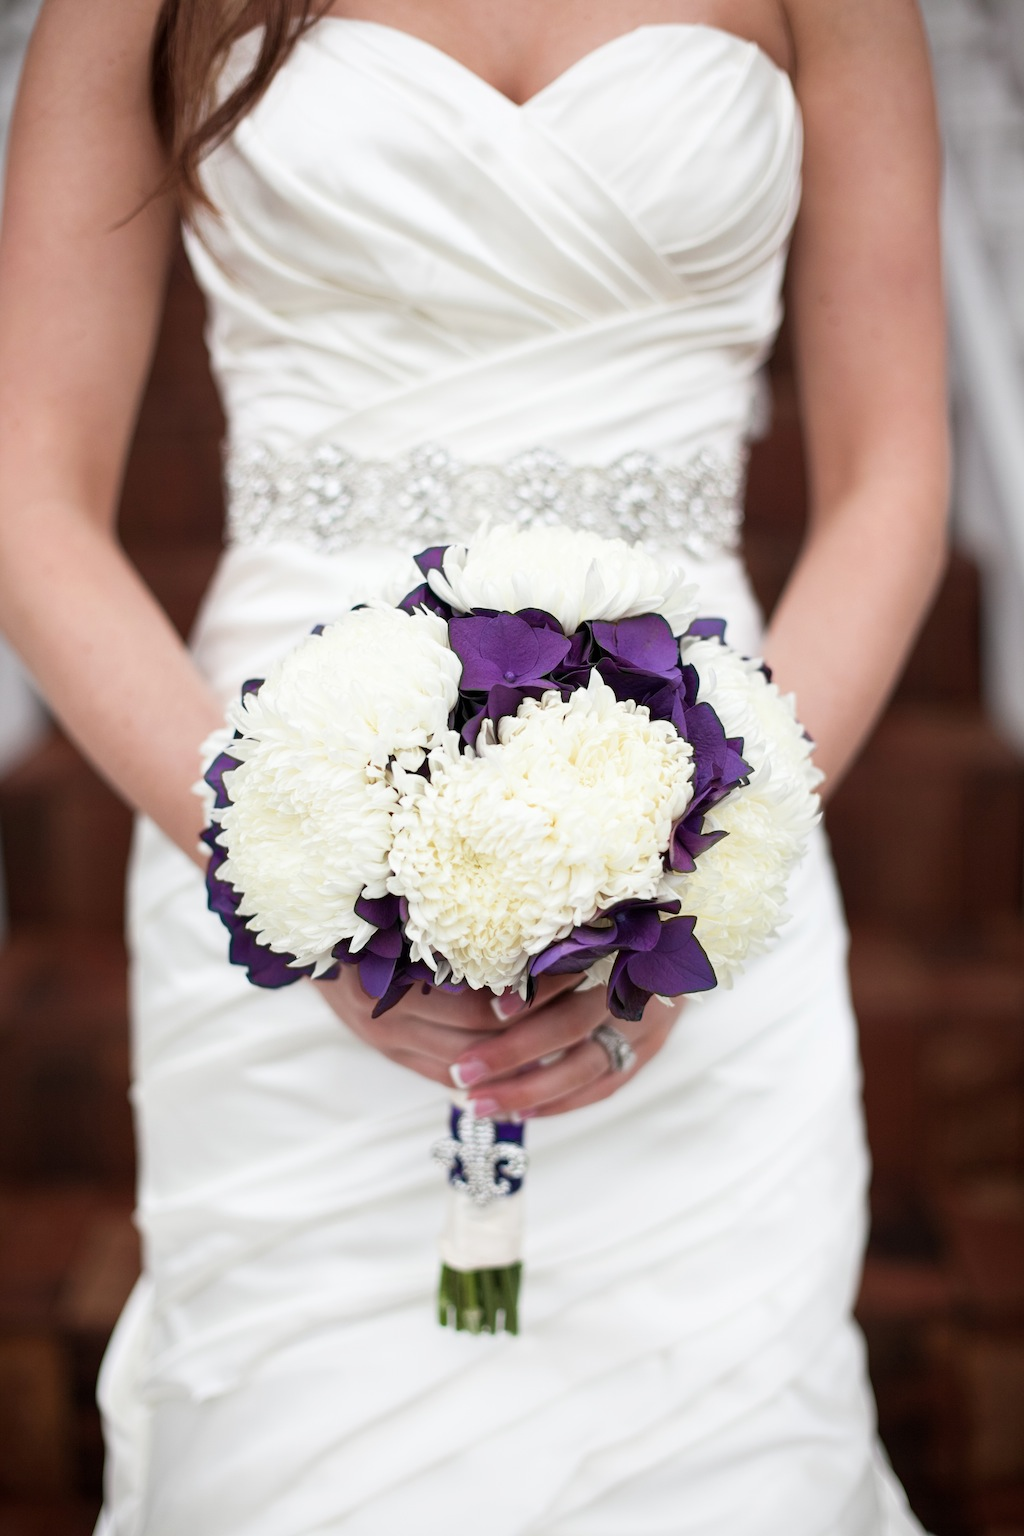 Brooksville Wedding - Purple, Silver & Ivory Wedding at Southern Hills Plantation Club - Brooksville Wedding Photographer Blue Lane Studios (22)